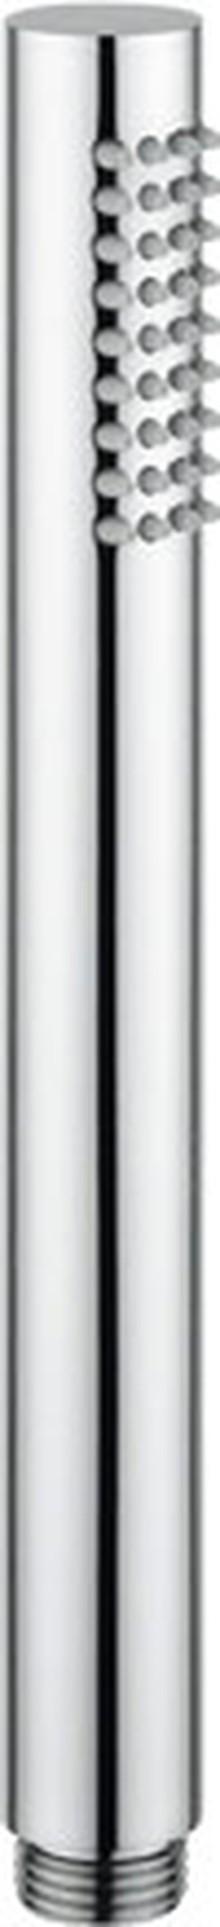 Душевая лейка M&Z ACS55038